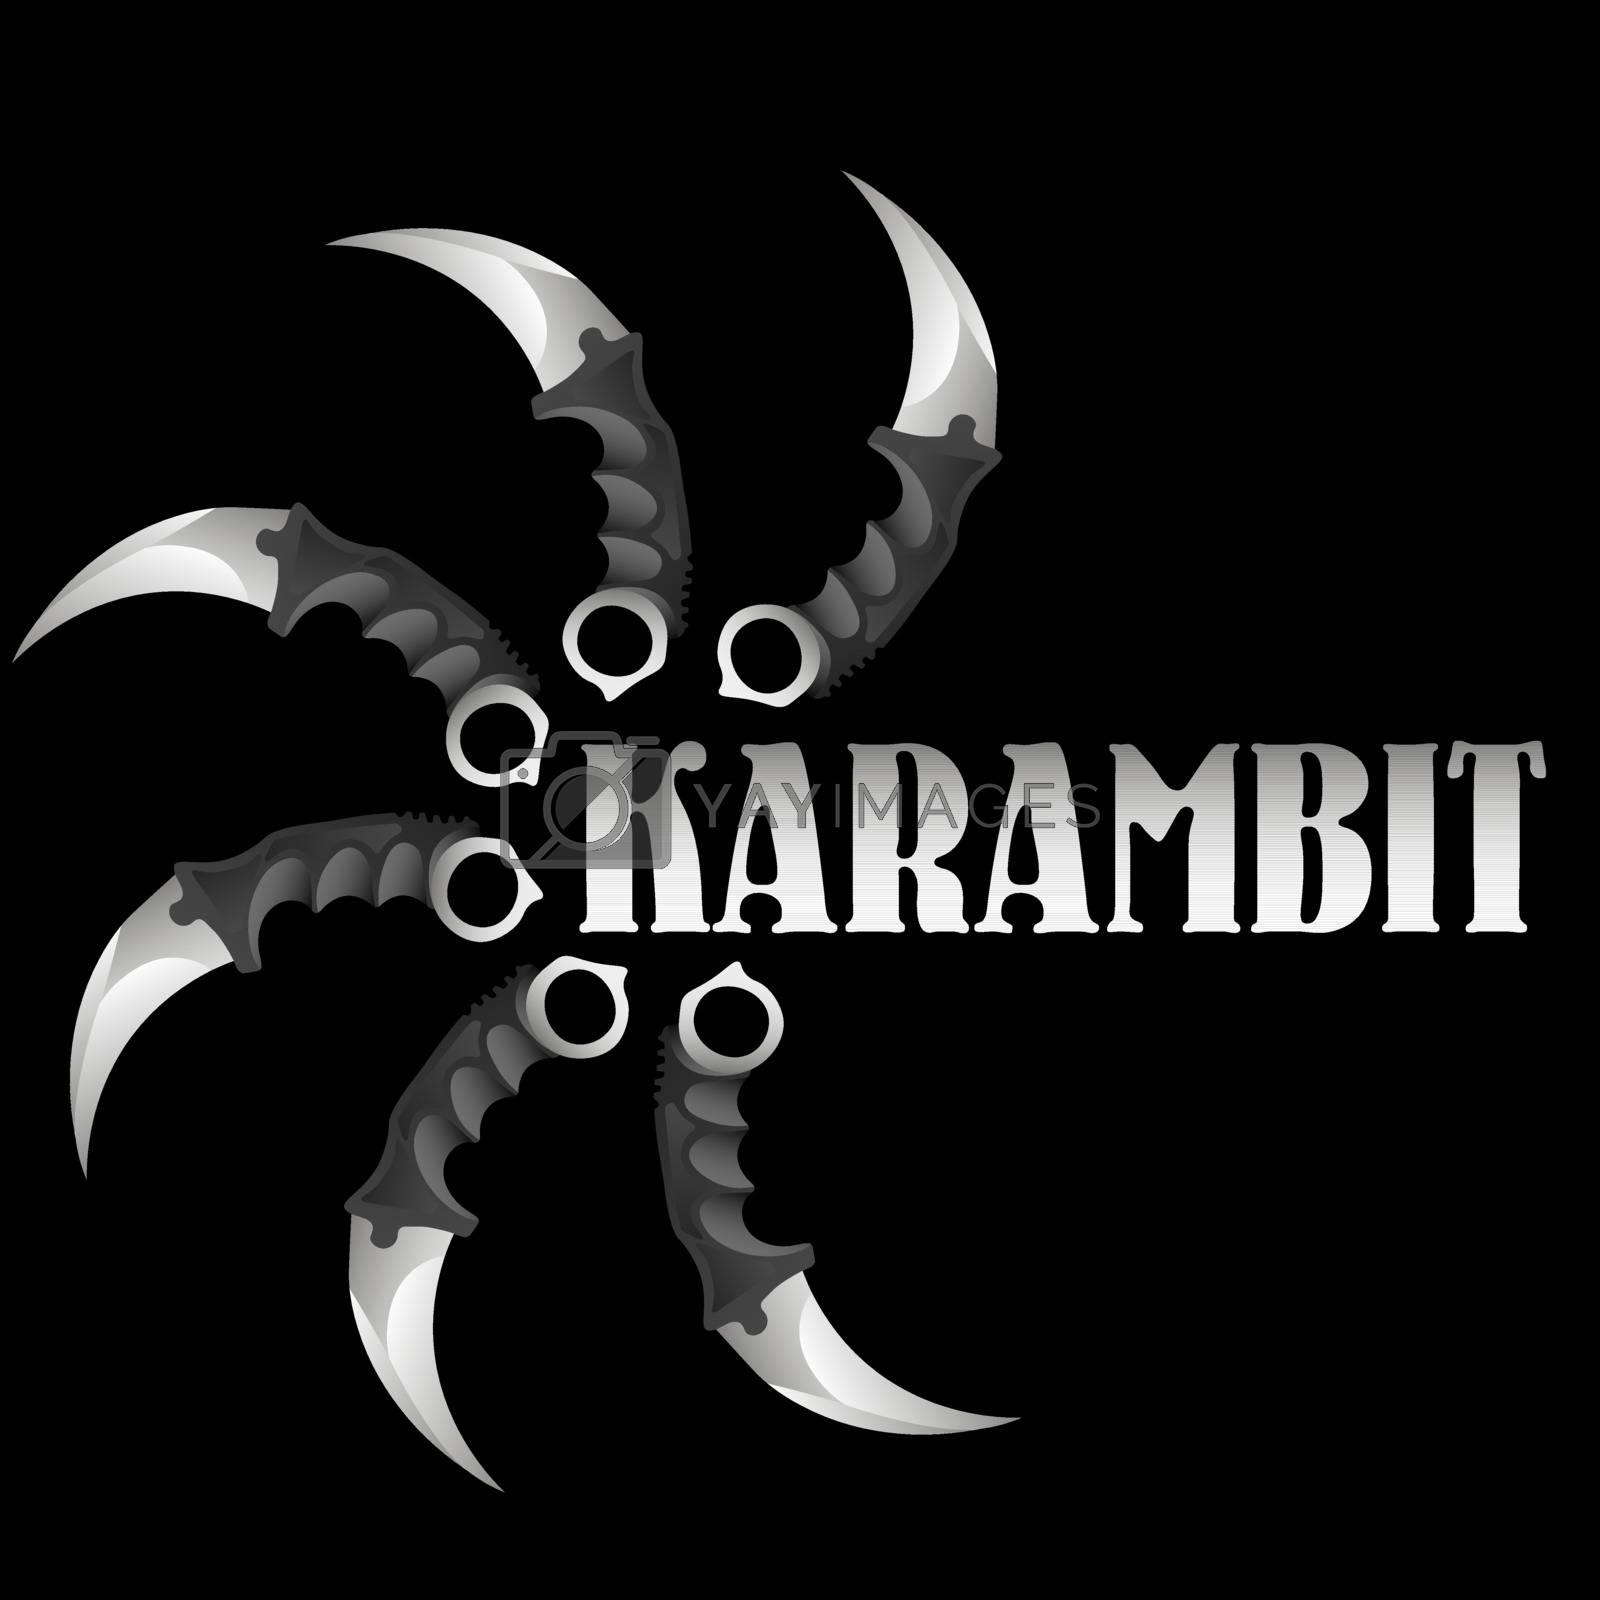 Six realistic karambits around the word 'karambit' on black background